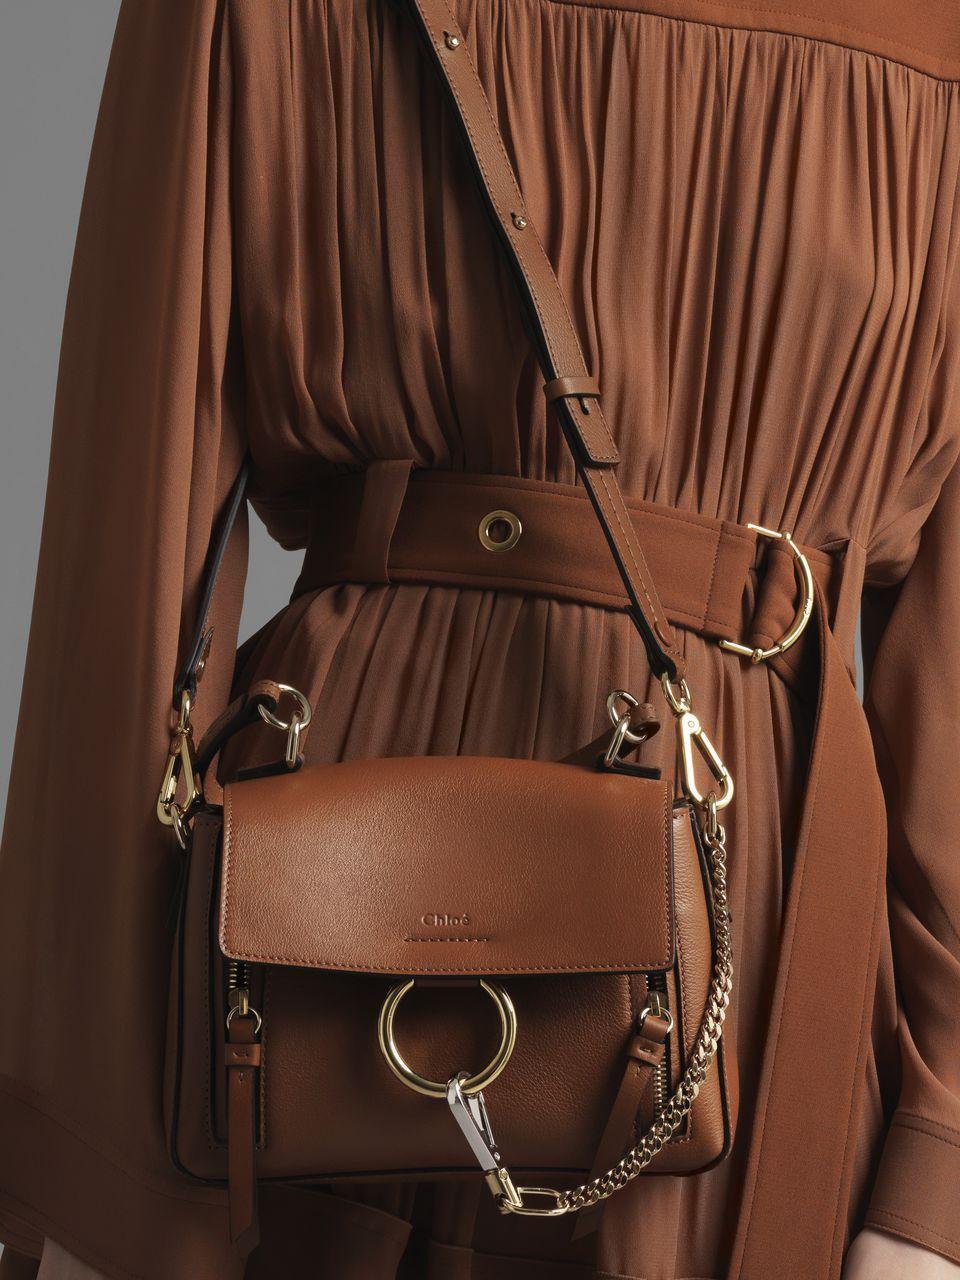 0356d9ad8b Chloe Mini Faye Day Shoulder Bag | High End Wishlist in 2019 | Bags ...